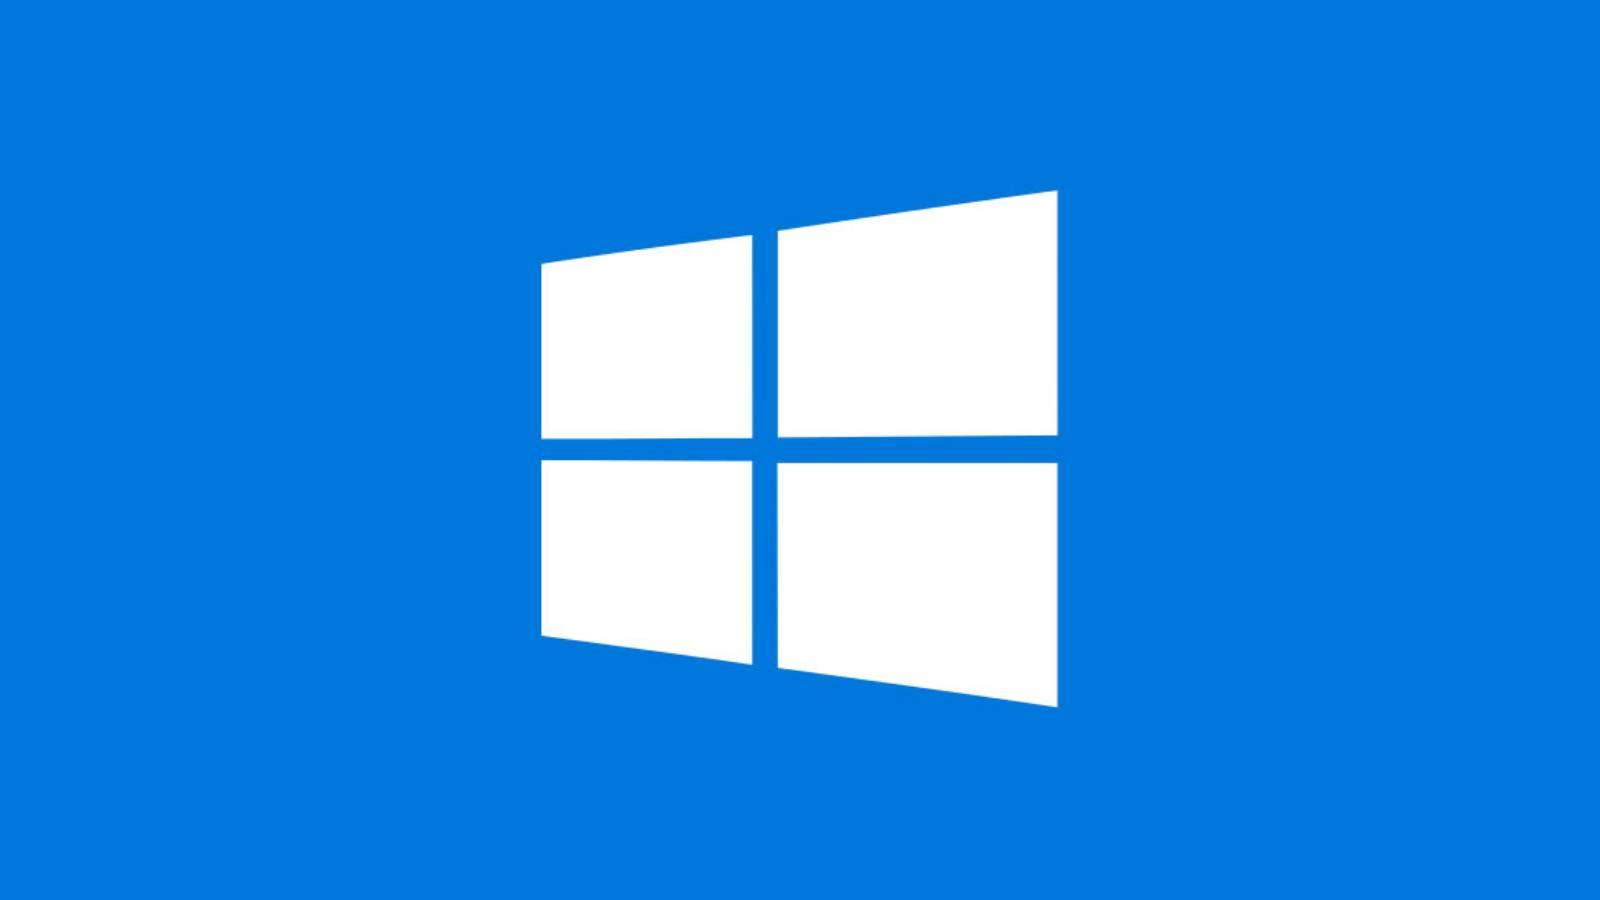 Windows nsa